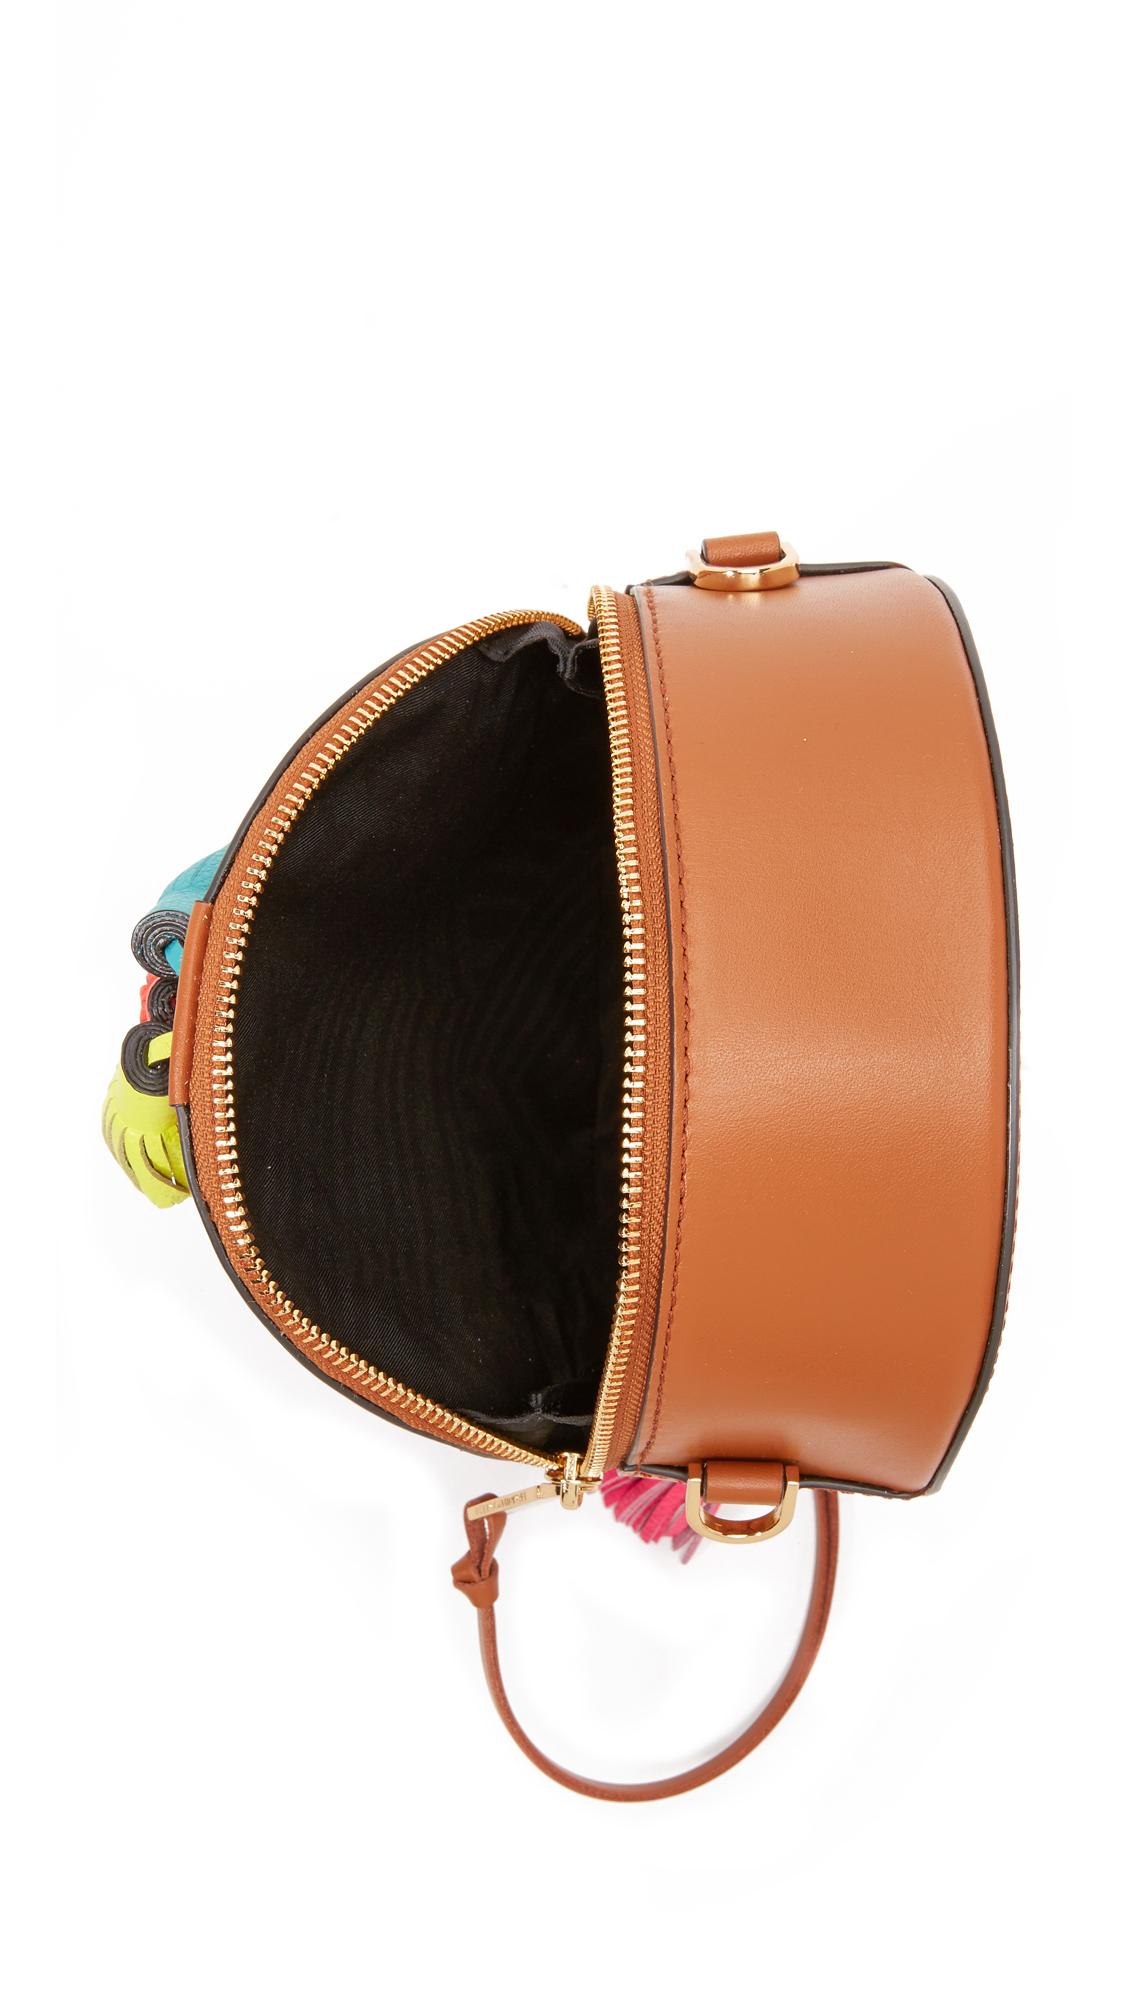 Rebecca Minkoff Leather Round Sofia Cross Body Bag in Almond (Brown)